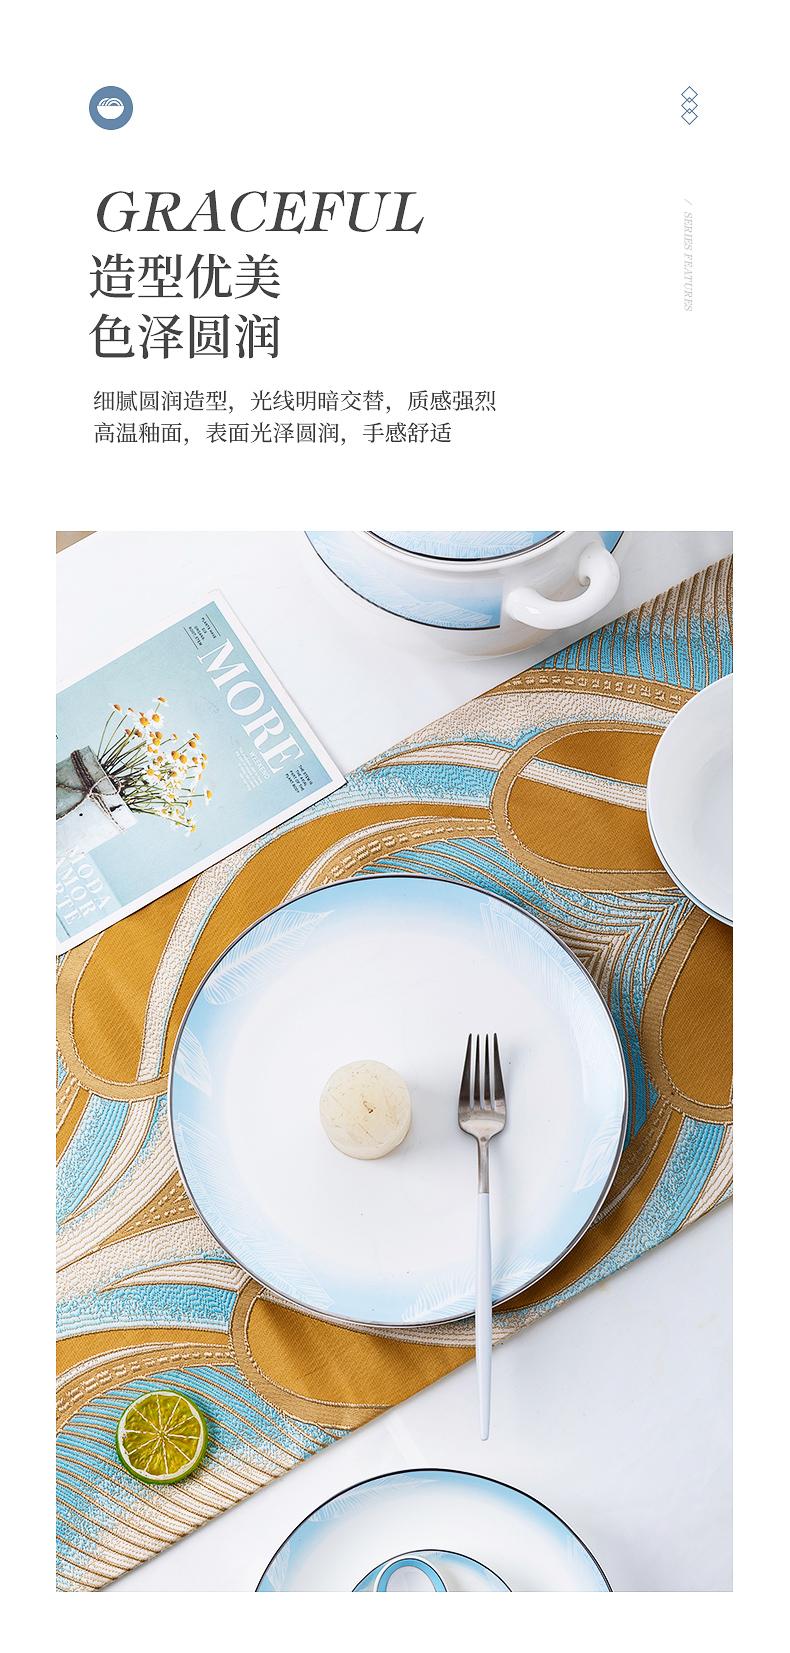 Wooden house product dishes suit household Nordic breeze light key-2 luxury housewarming ipads porcelain tableware suit jingdezhen dishes